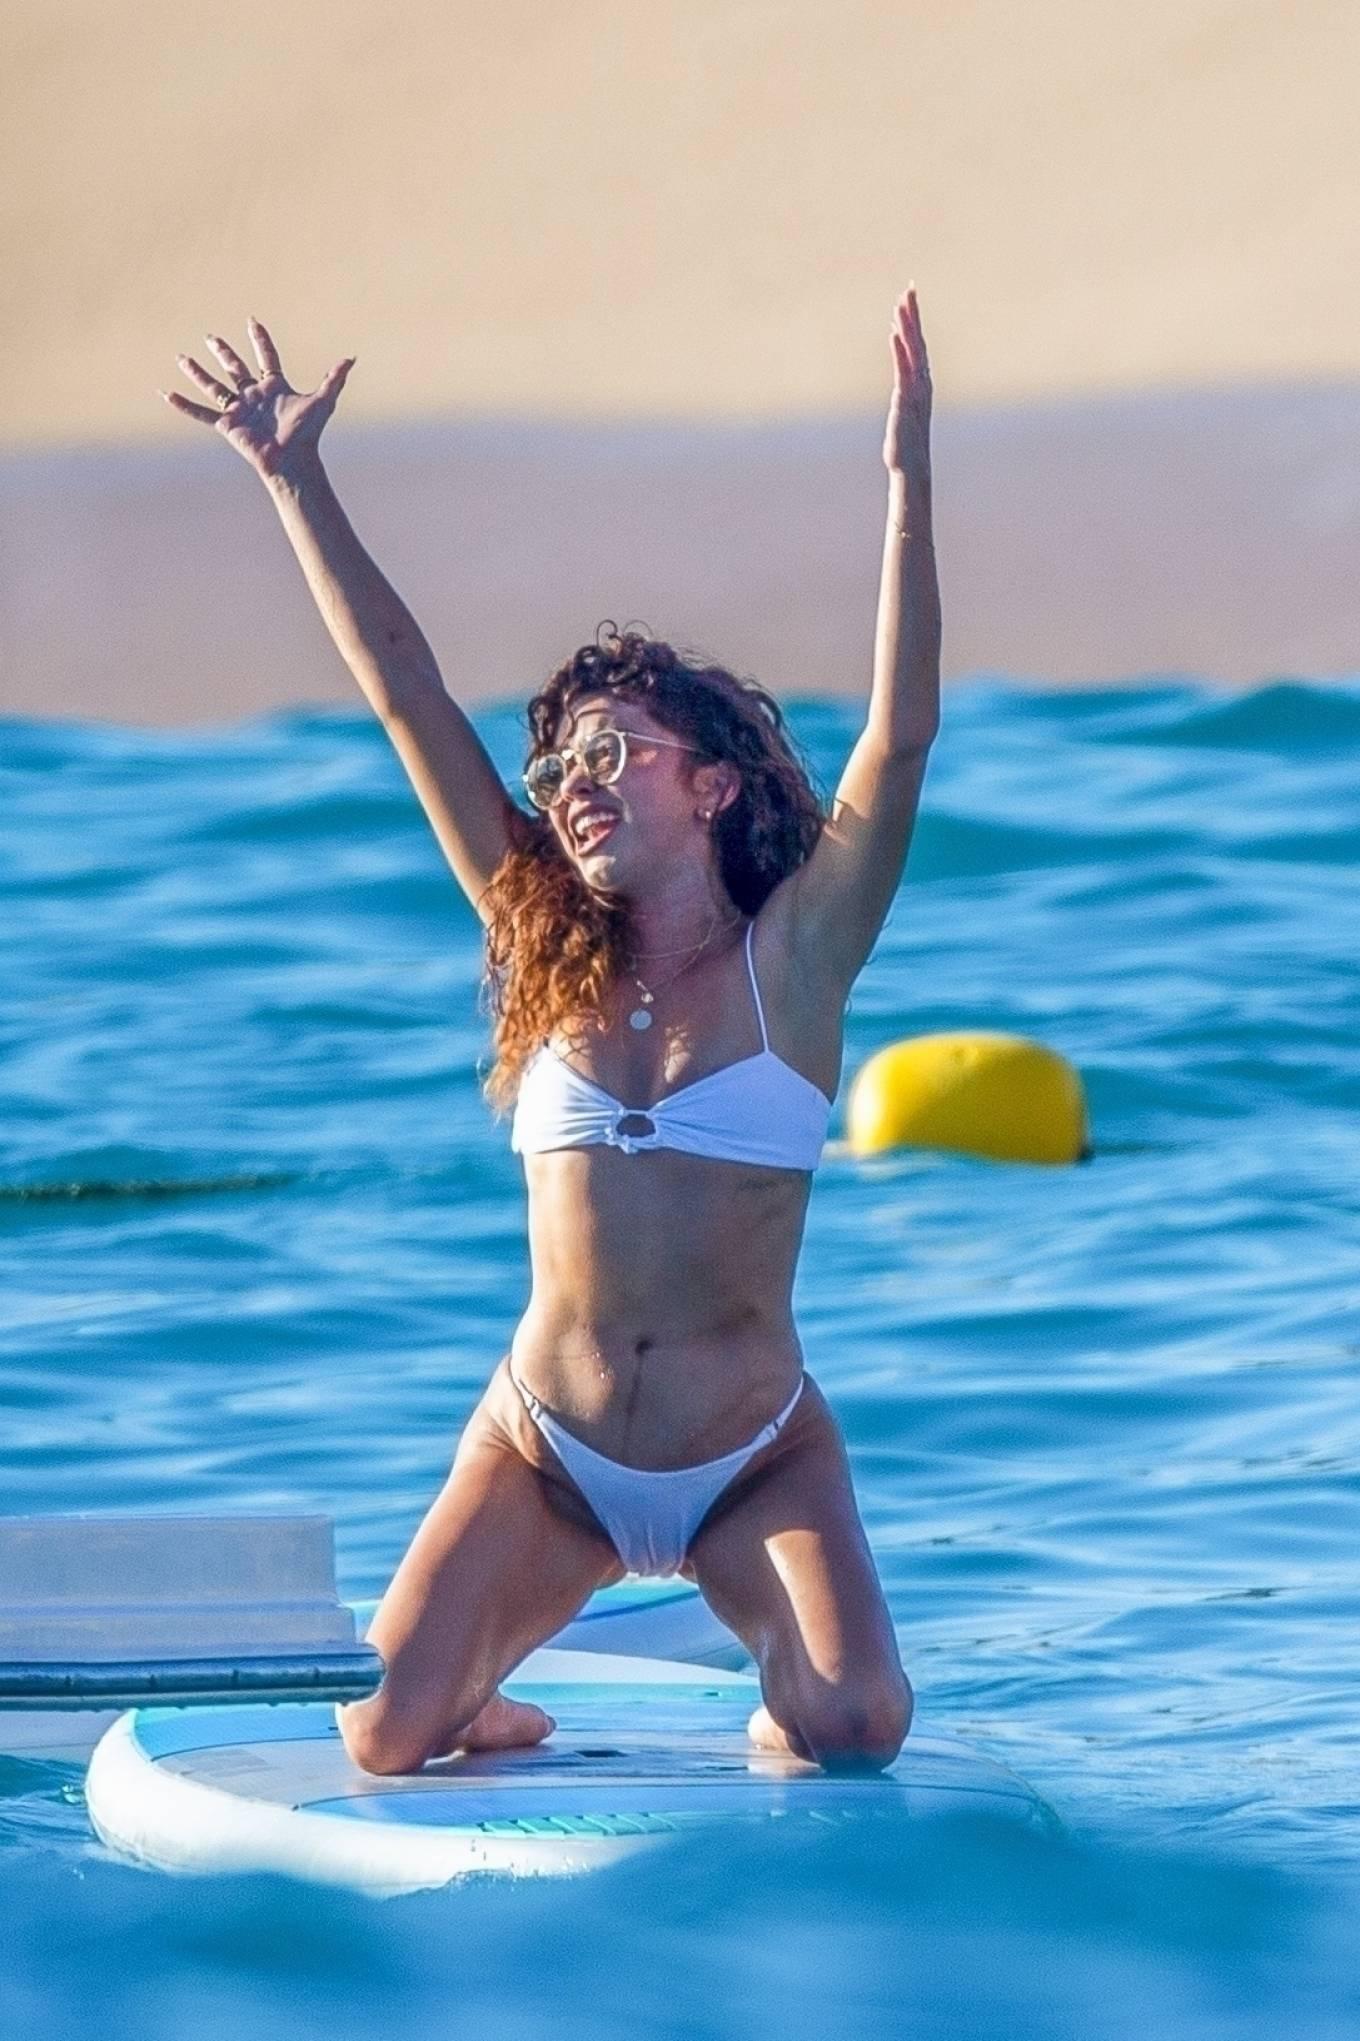 Sarah Hyland - In sizzling high-rise bikini on a boat in Cabo San Lucas